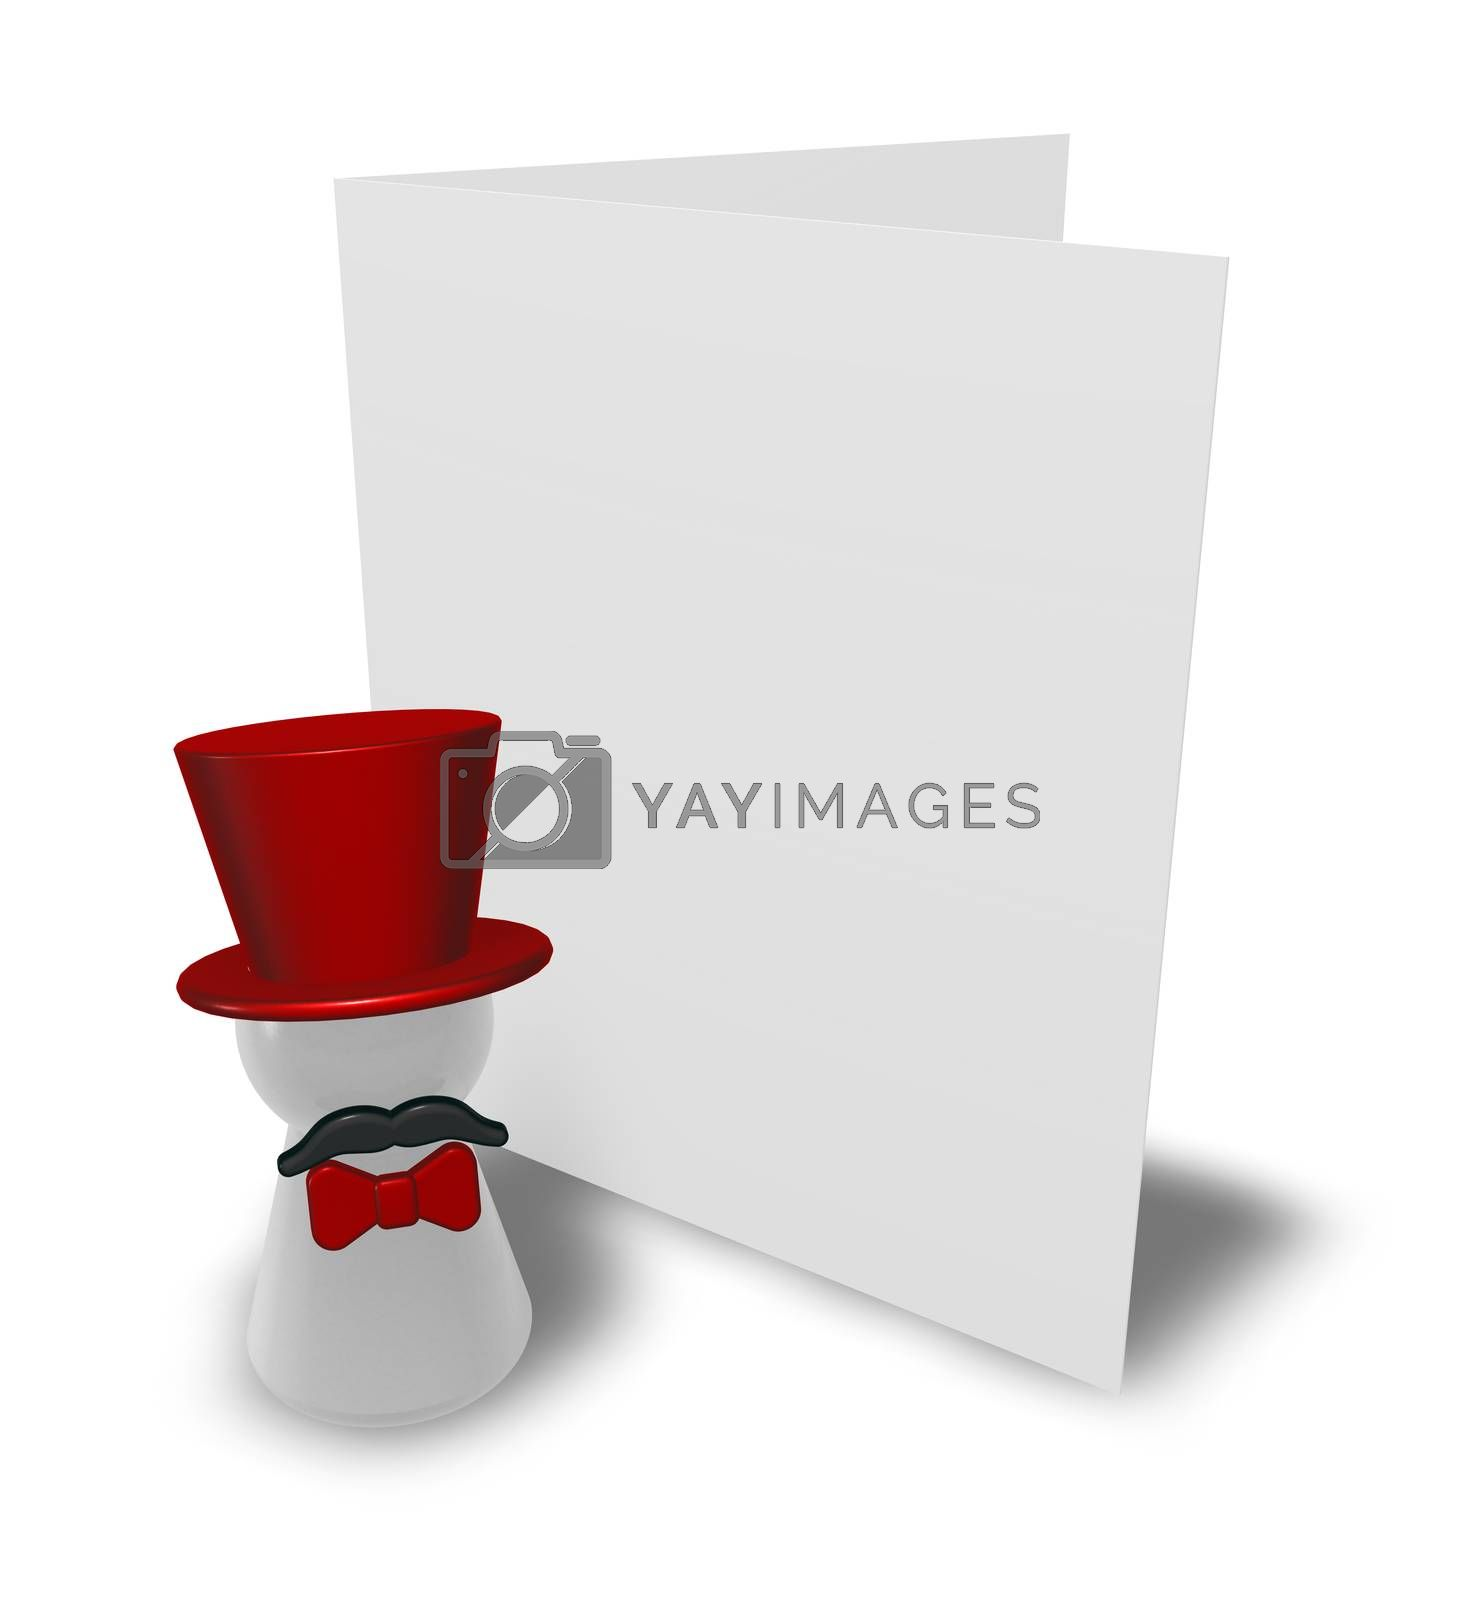 ringmaster and congratulation card - 3d illustration